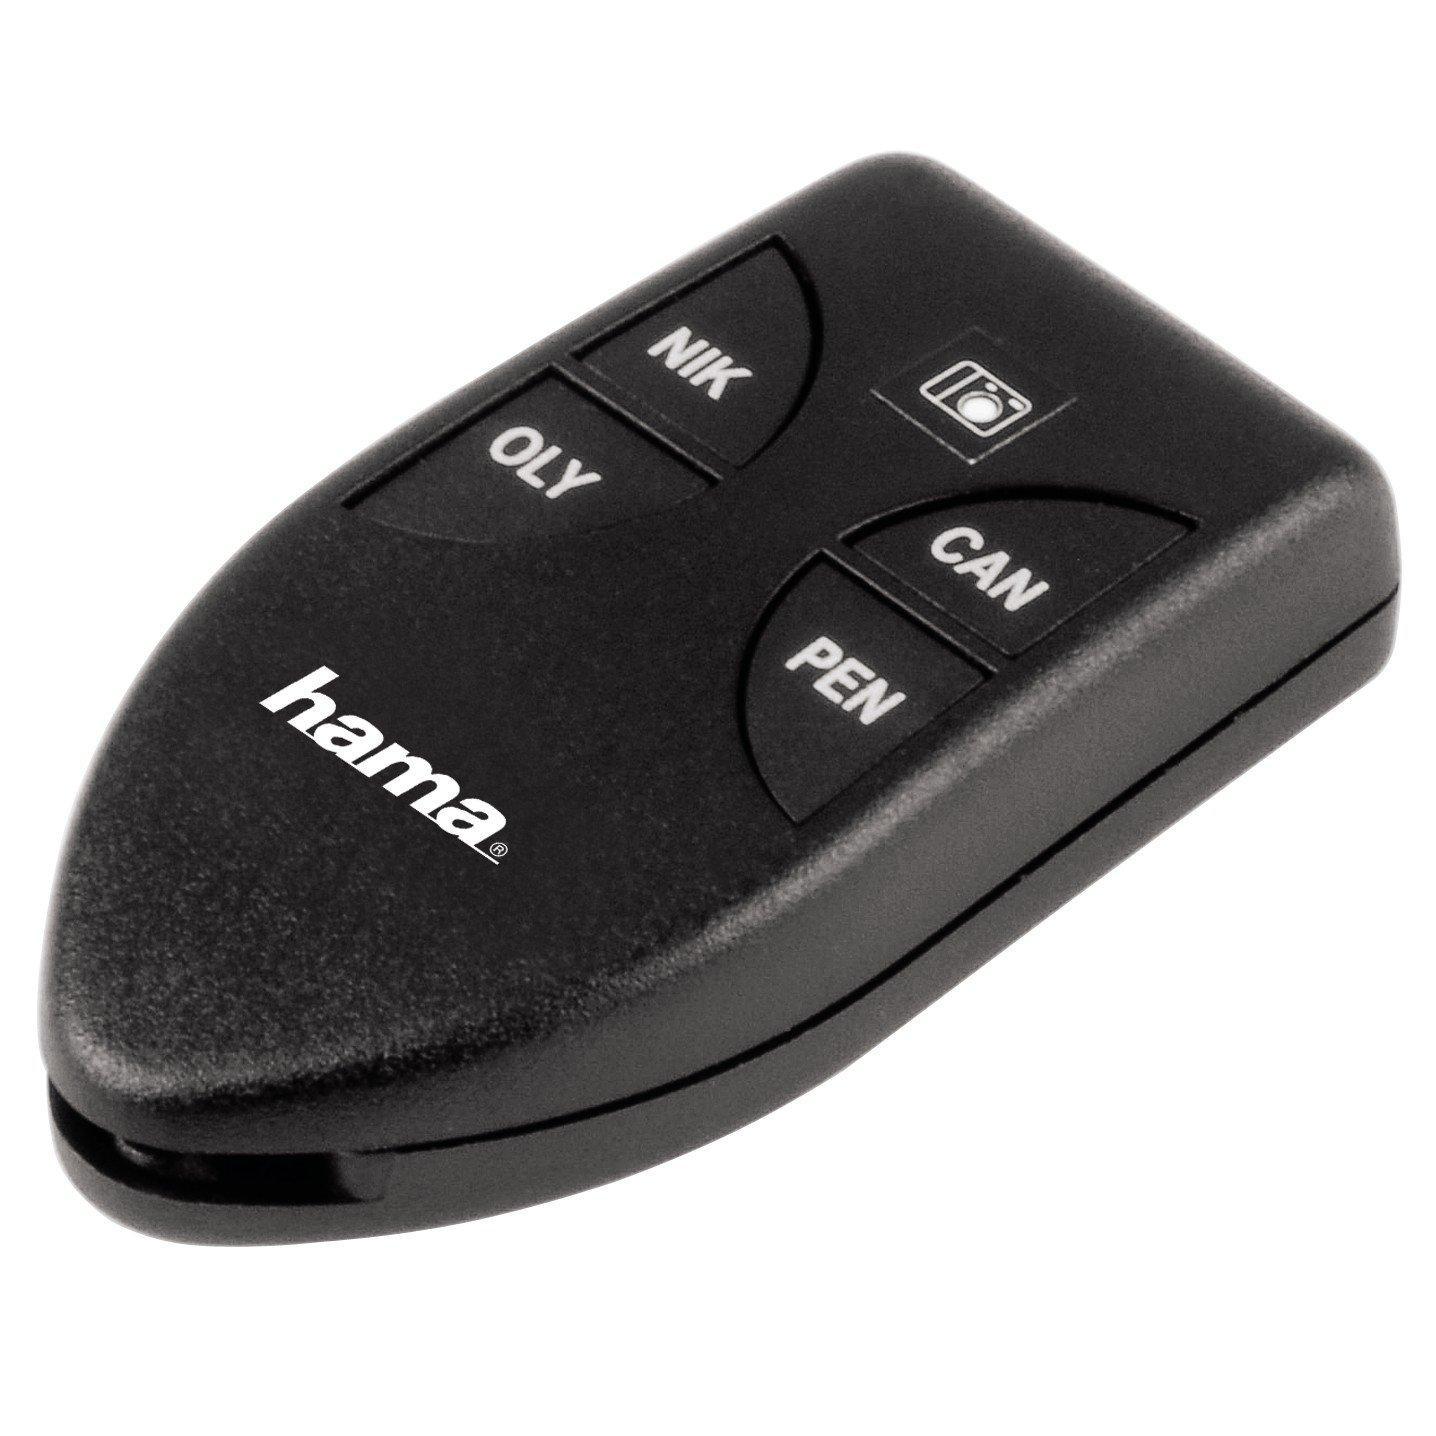 Mini 2 Universal IR control remoto Release para DSLR cameras Hama 70 x 36 x 15 mm Litio-Ion